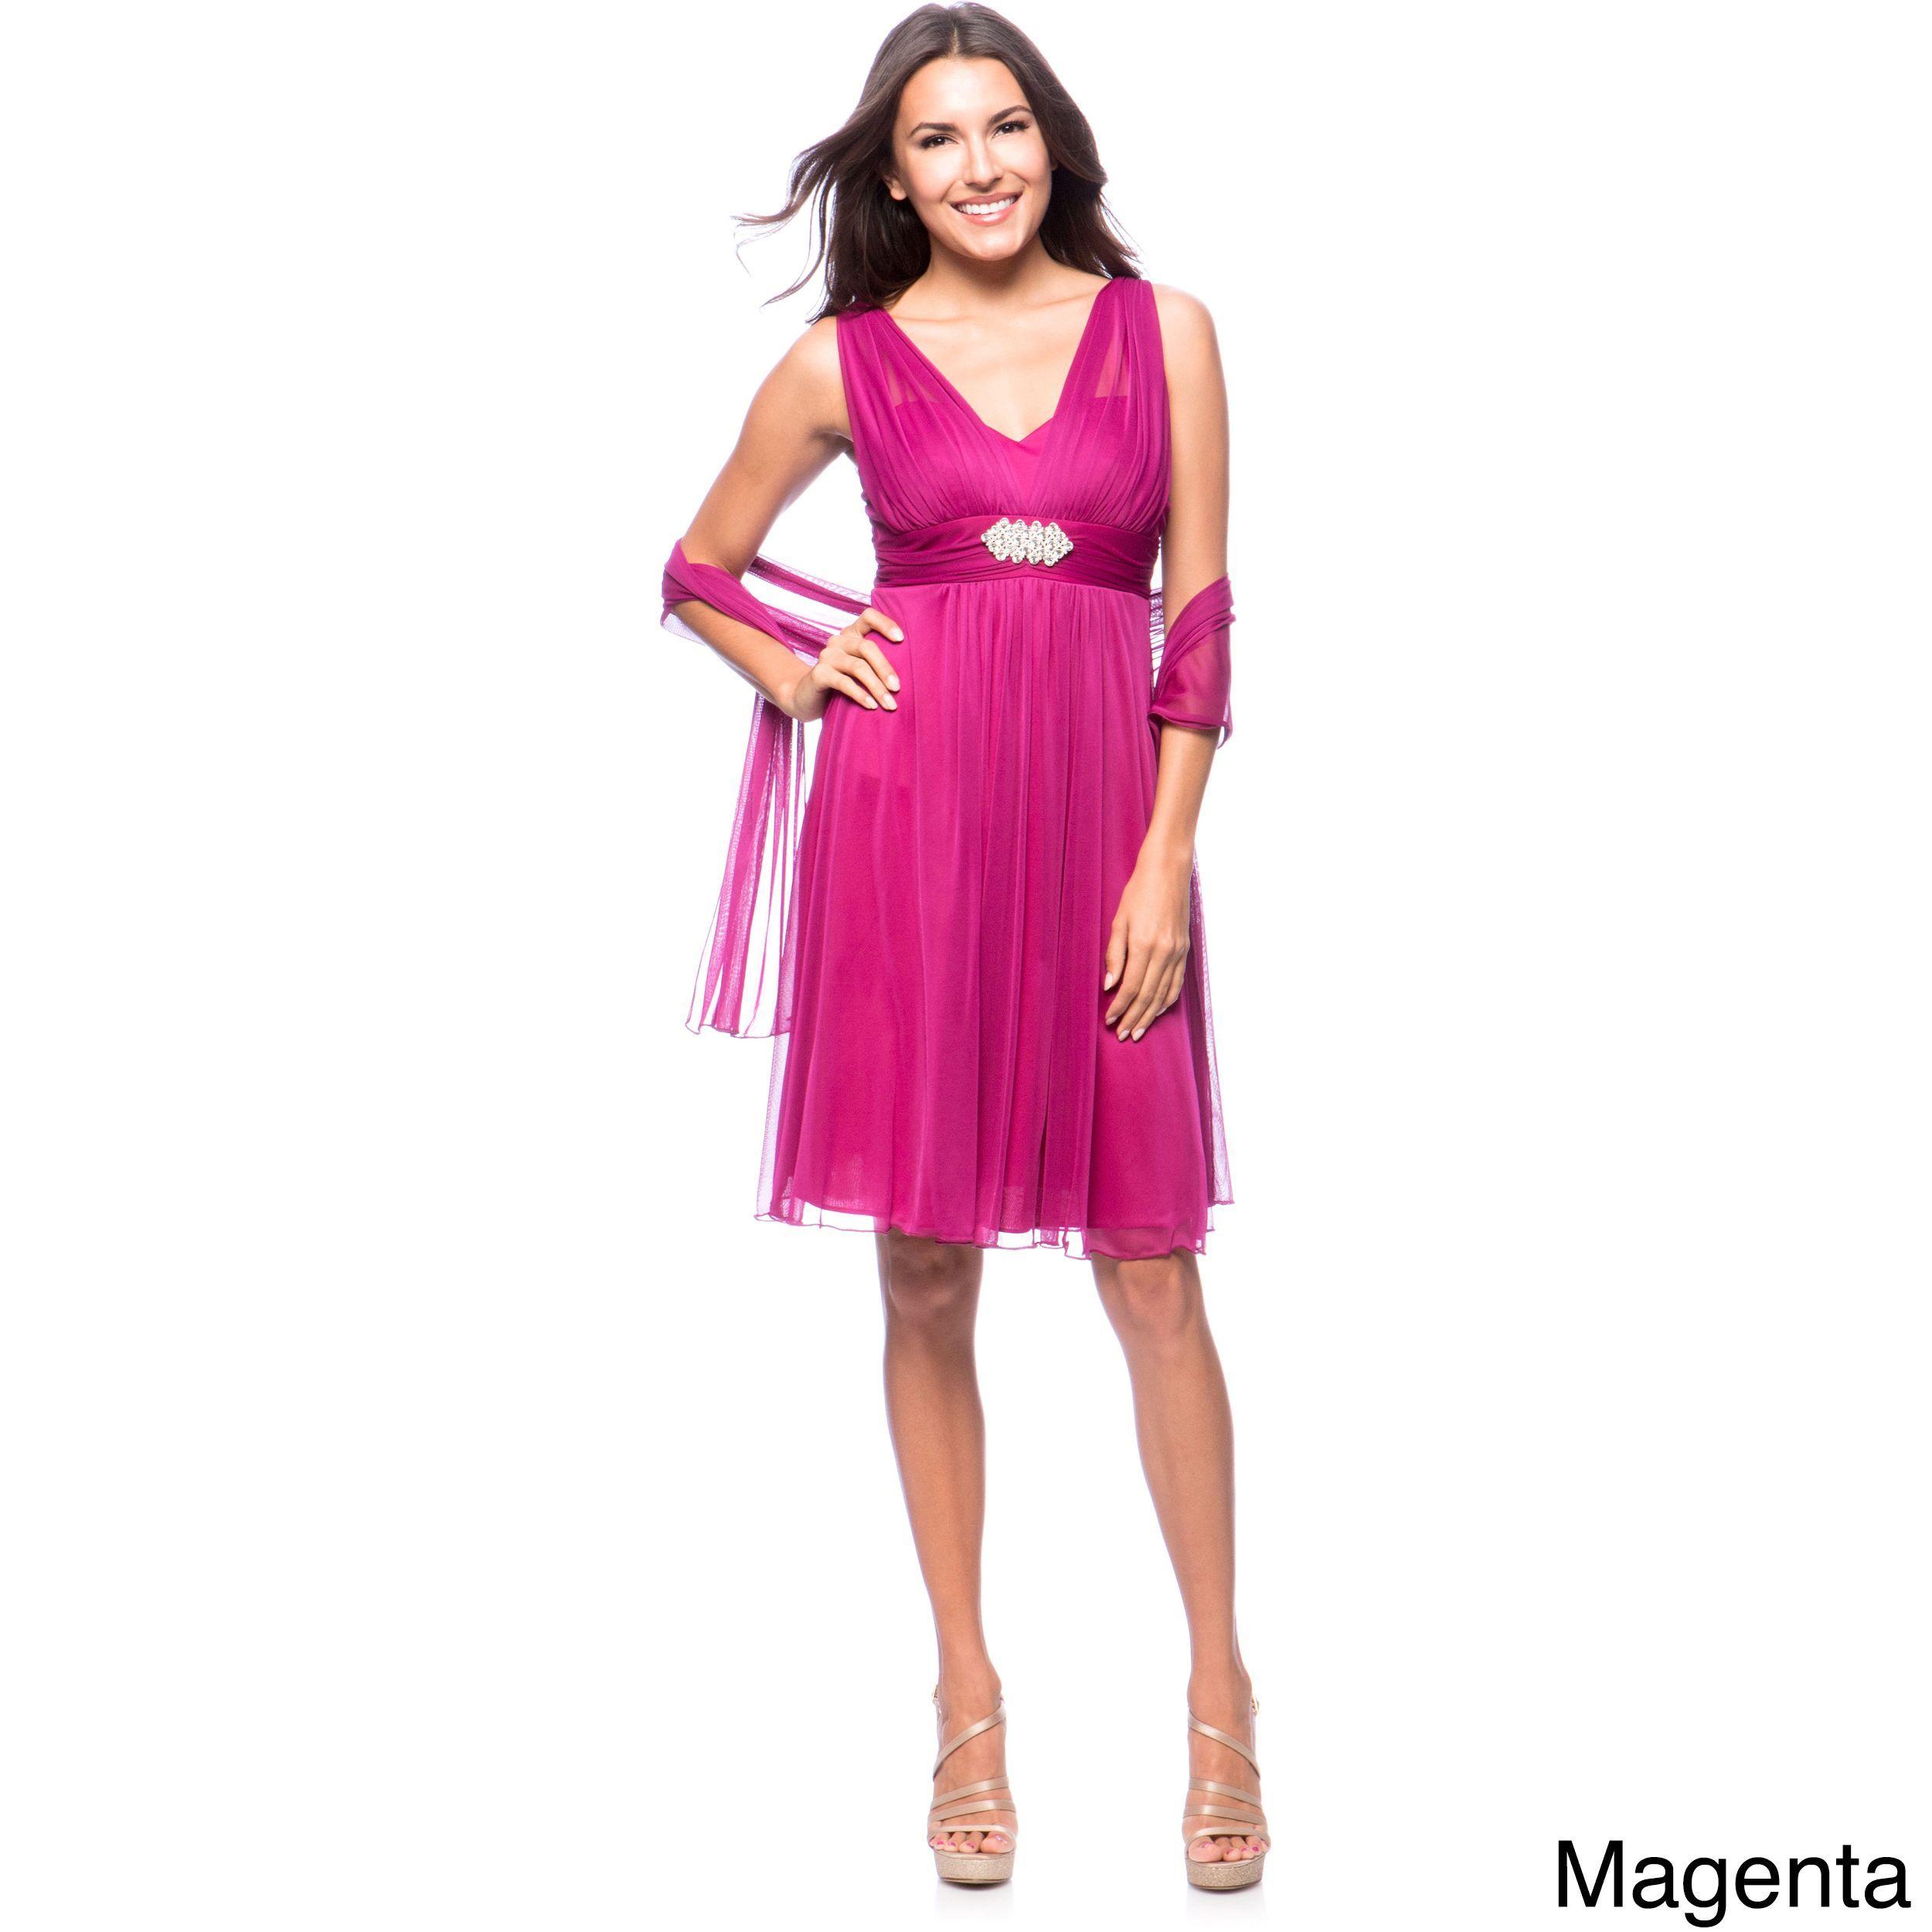 Dfi womenus short evening gown dress with rhinestone broach